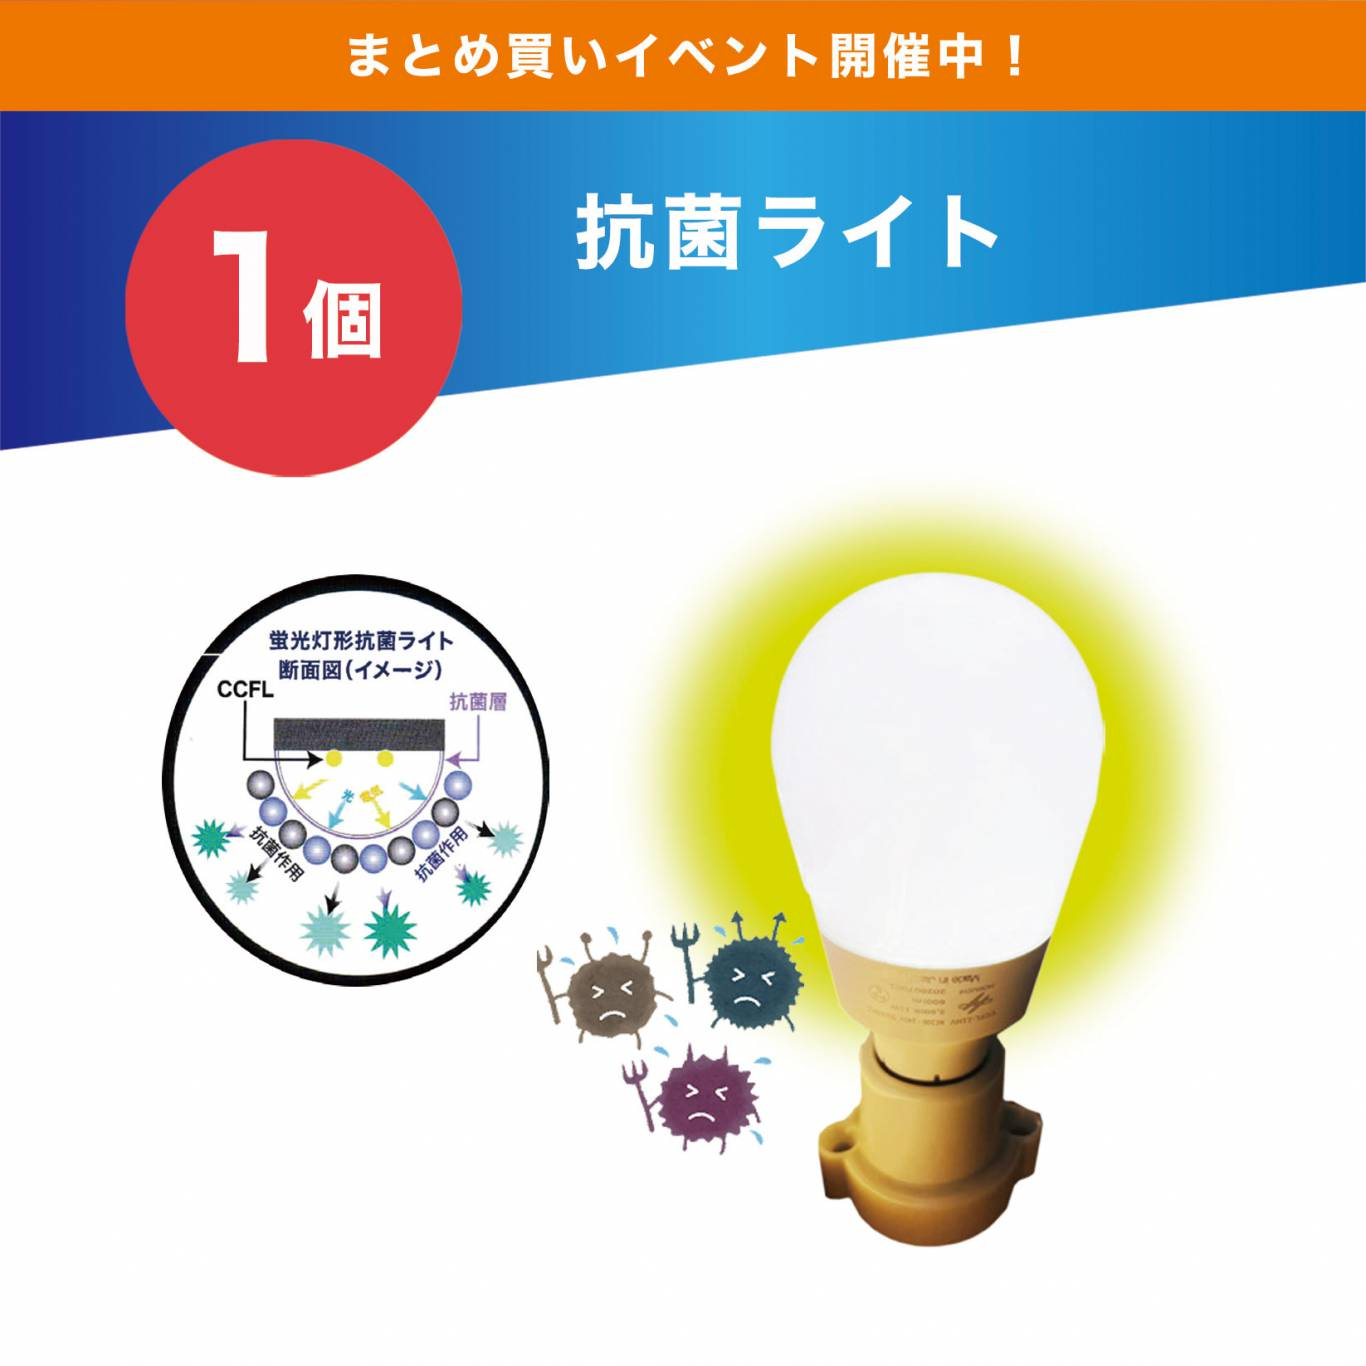 EVENT】安心生活! CCFL抗菌ライト 1個買い(10,000円⇒9,000円 1,000円お得!激安)